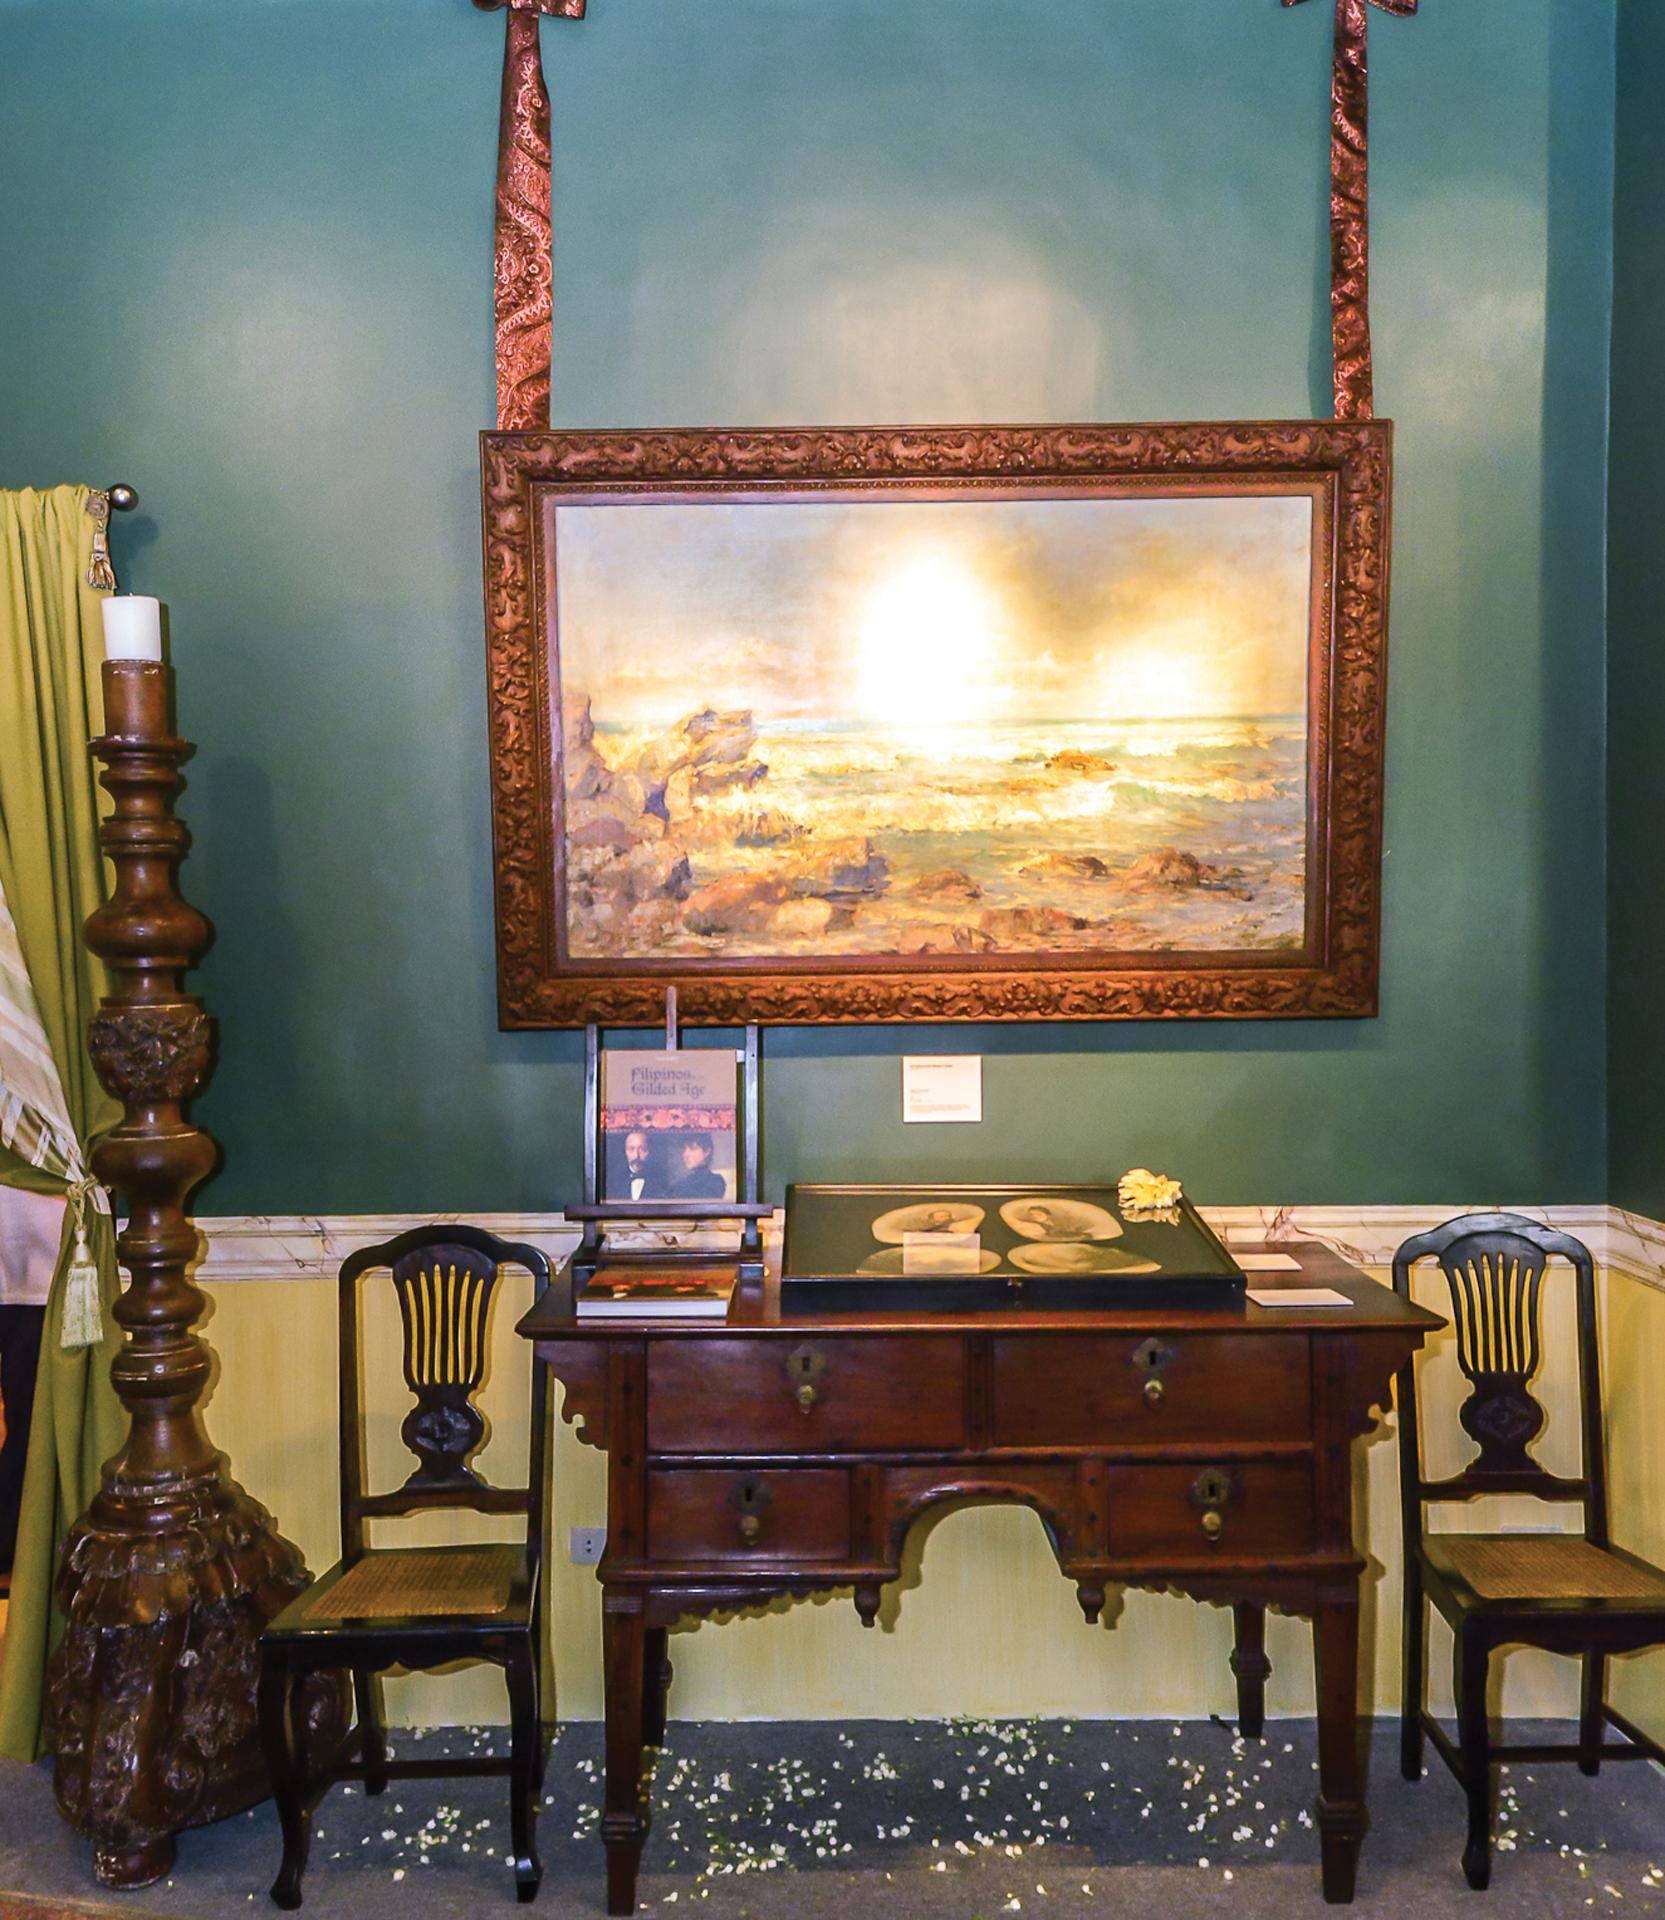 Aparador Alto Moderno ~ Leon Gallery Highlights 19th Century Filipino Art